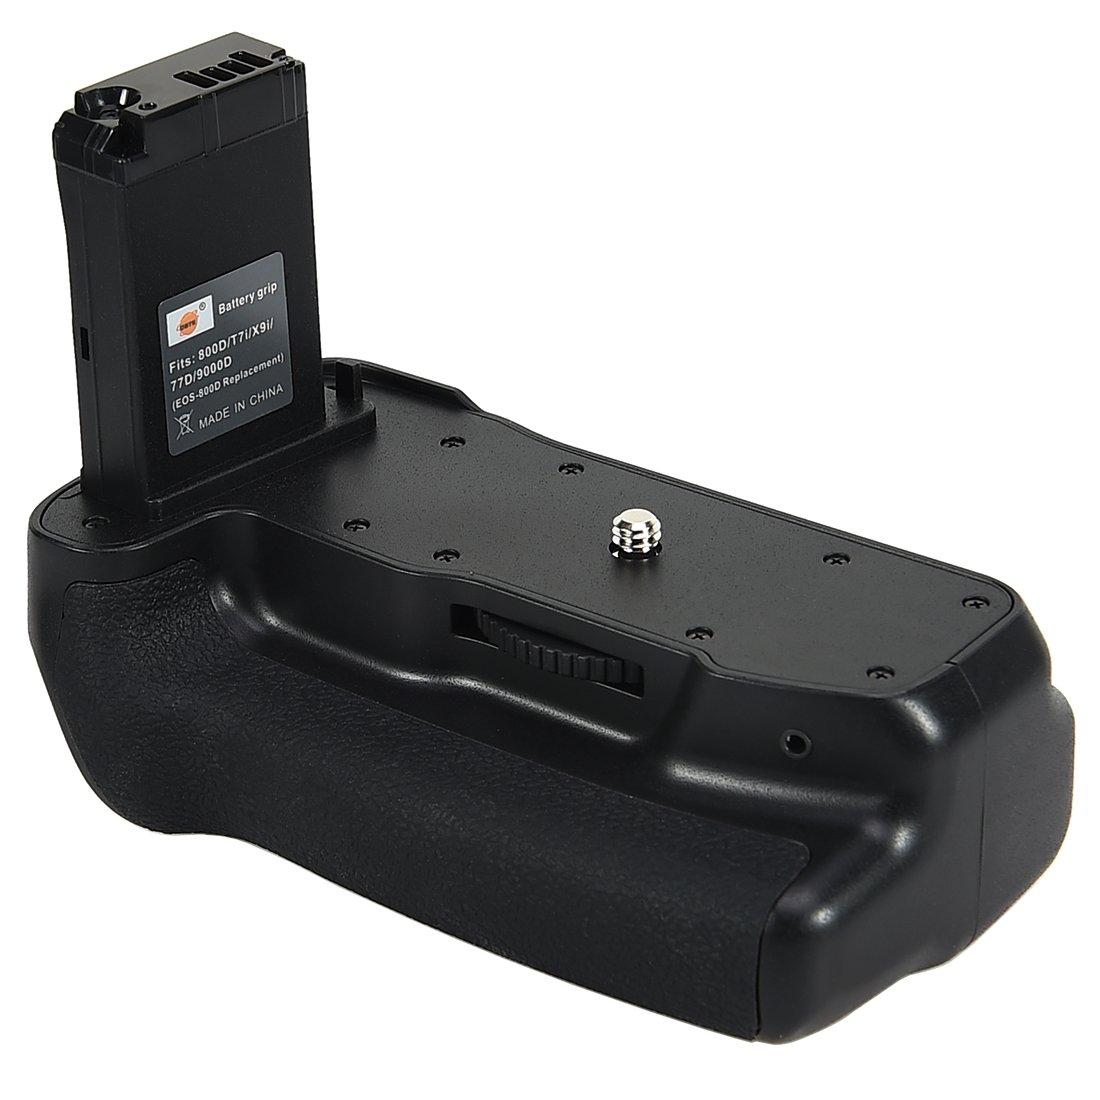 2 Bater/ías LP-E17 y Cargador USB DSTE EOS-800D Empu/ñadura de Bater/ía Compatible con Canon EOS 800D T7i X9i 77D 9000D